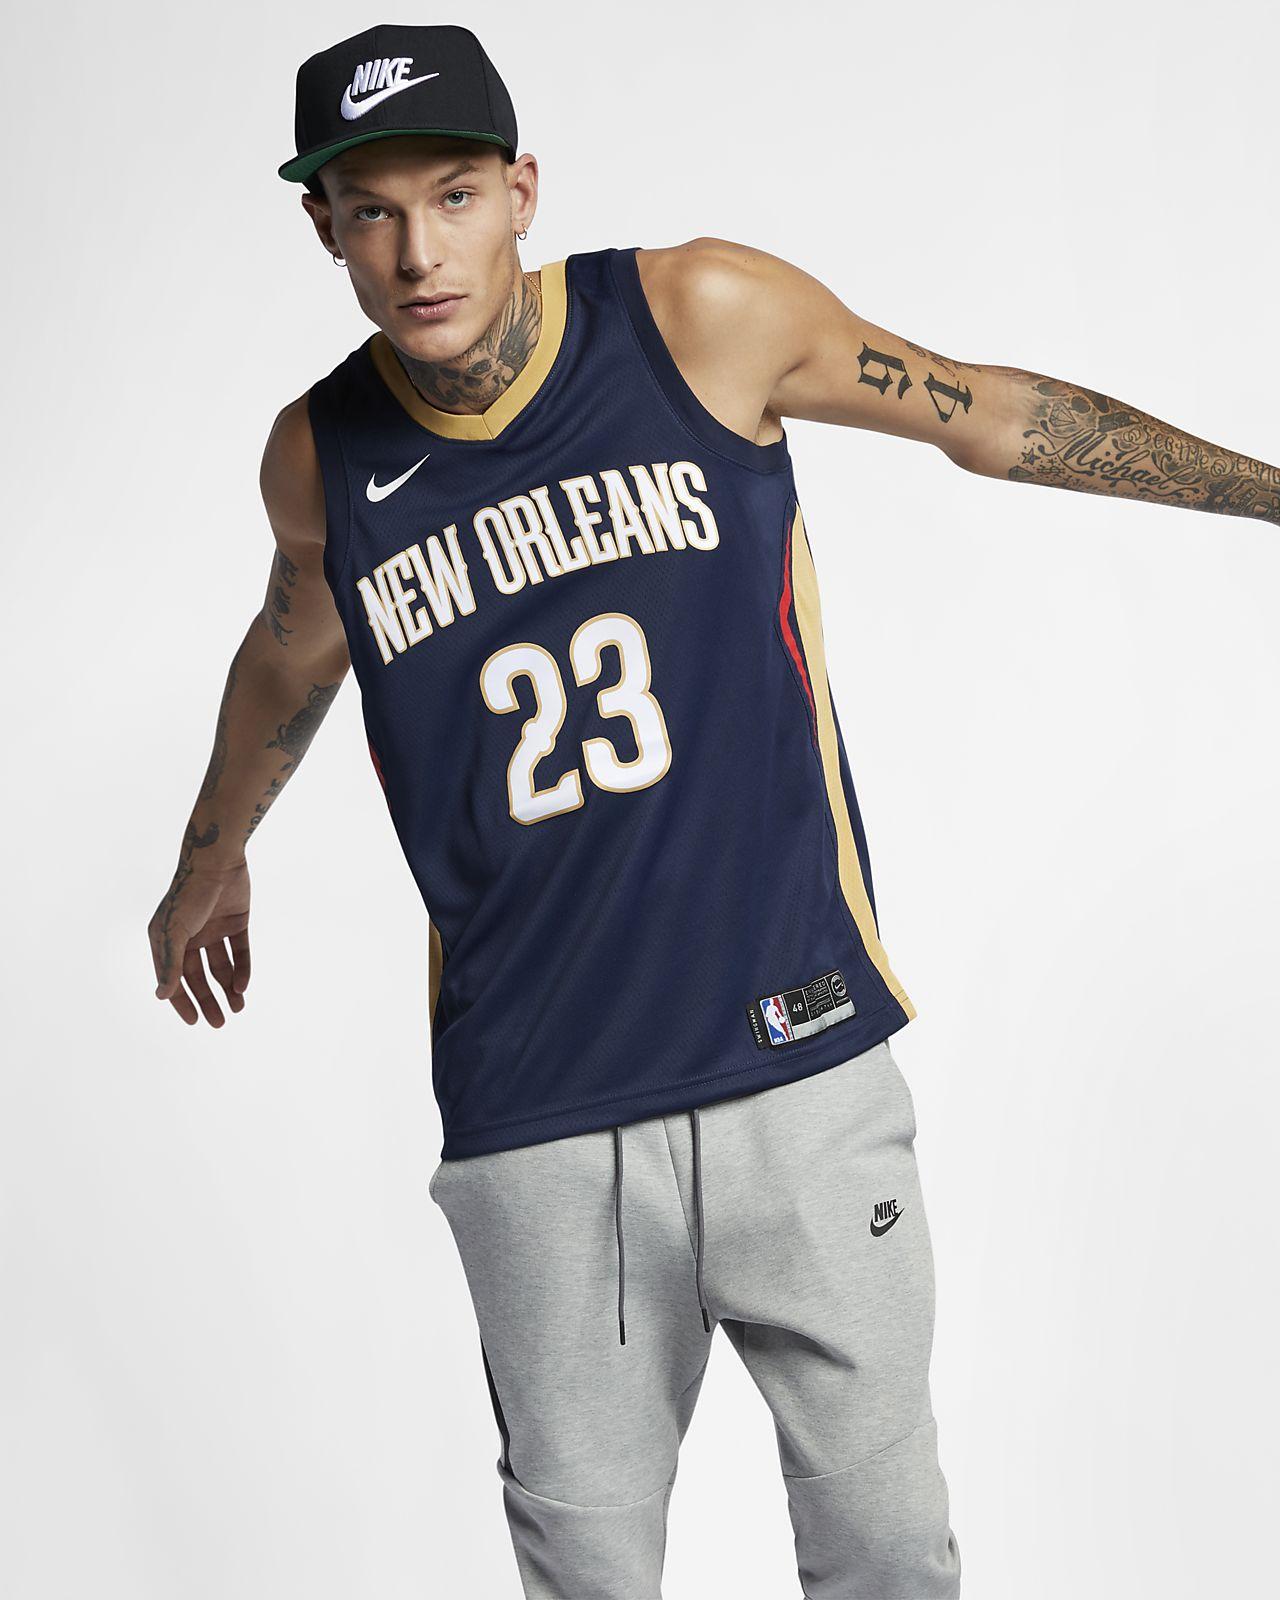 19812c779b66 ... Anthony Davis (nba) Icon Edition Swingman (New Orleans Pelicans) Men s  Nike NBA